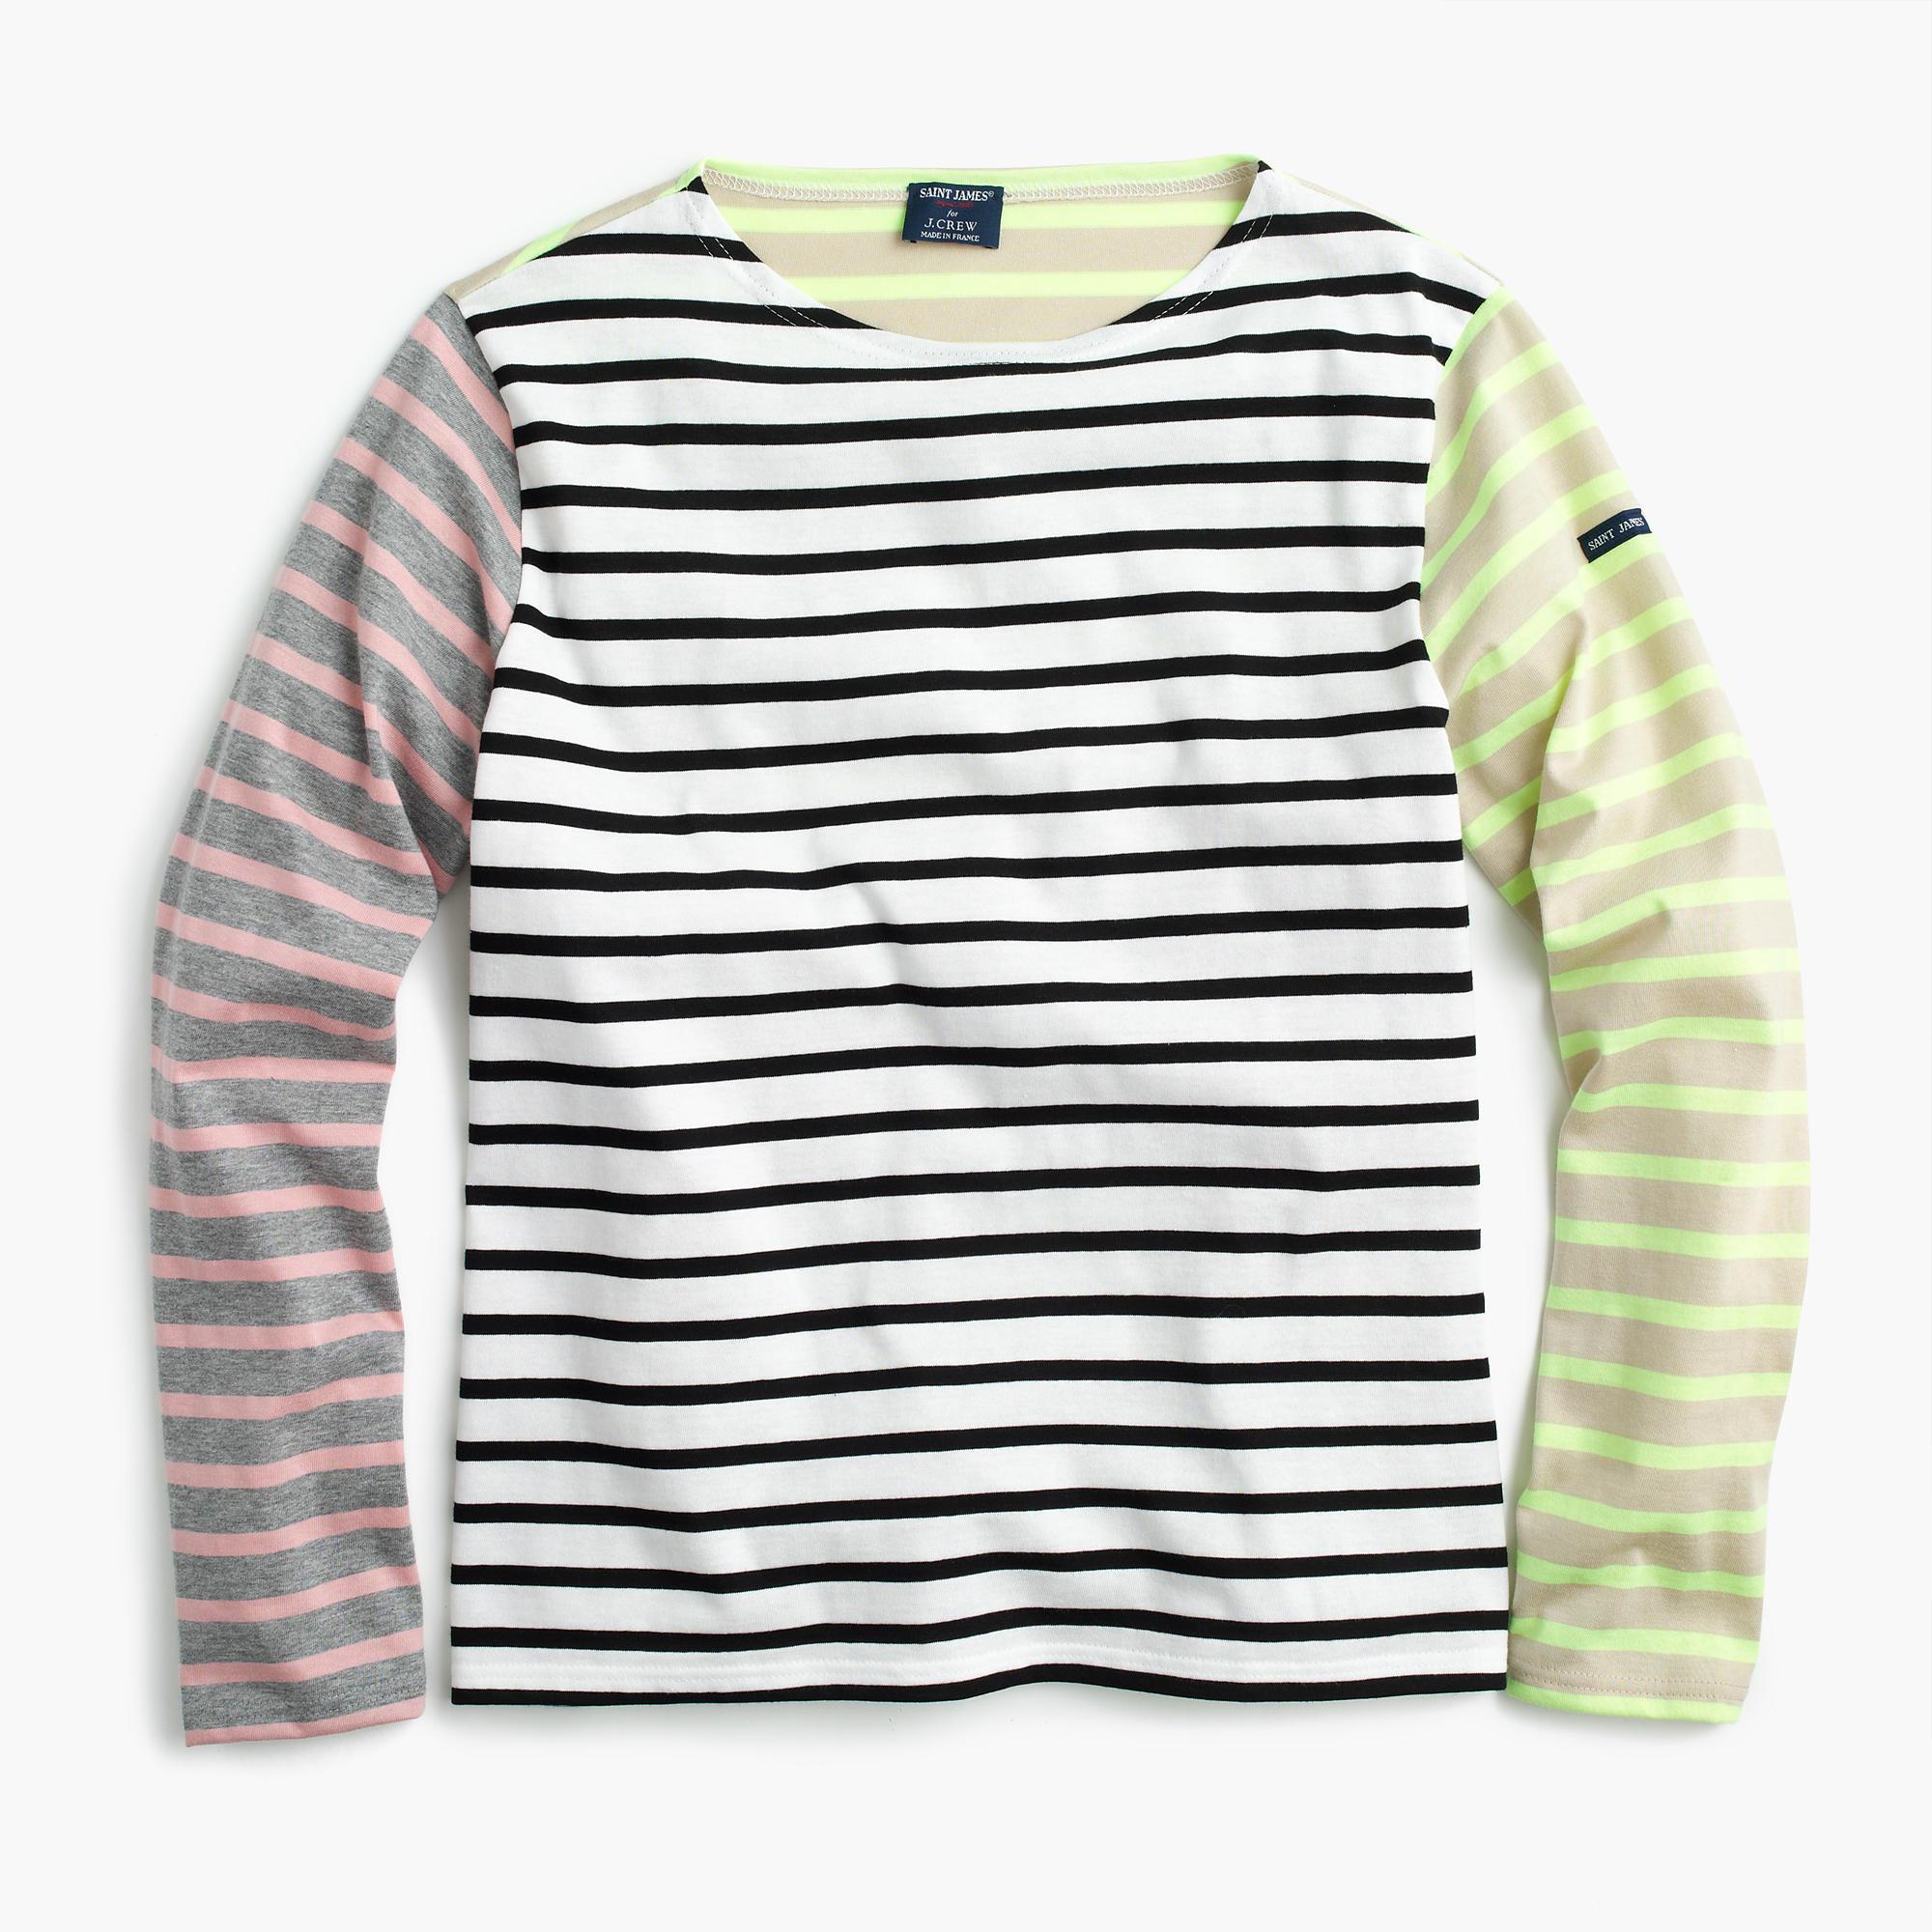 Saint james for j crew colorblock stripe t shirt women 39 s for St james striped shirt